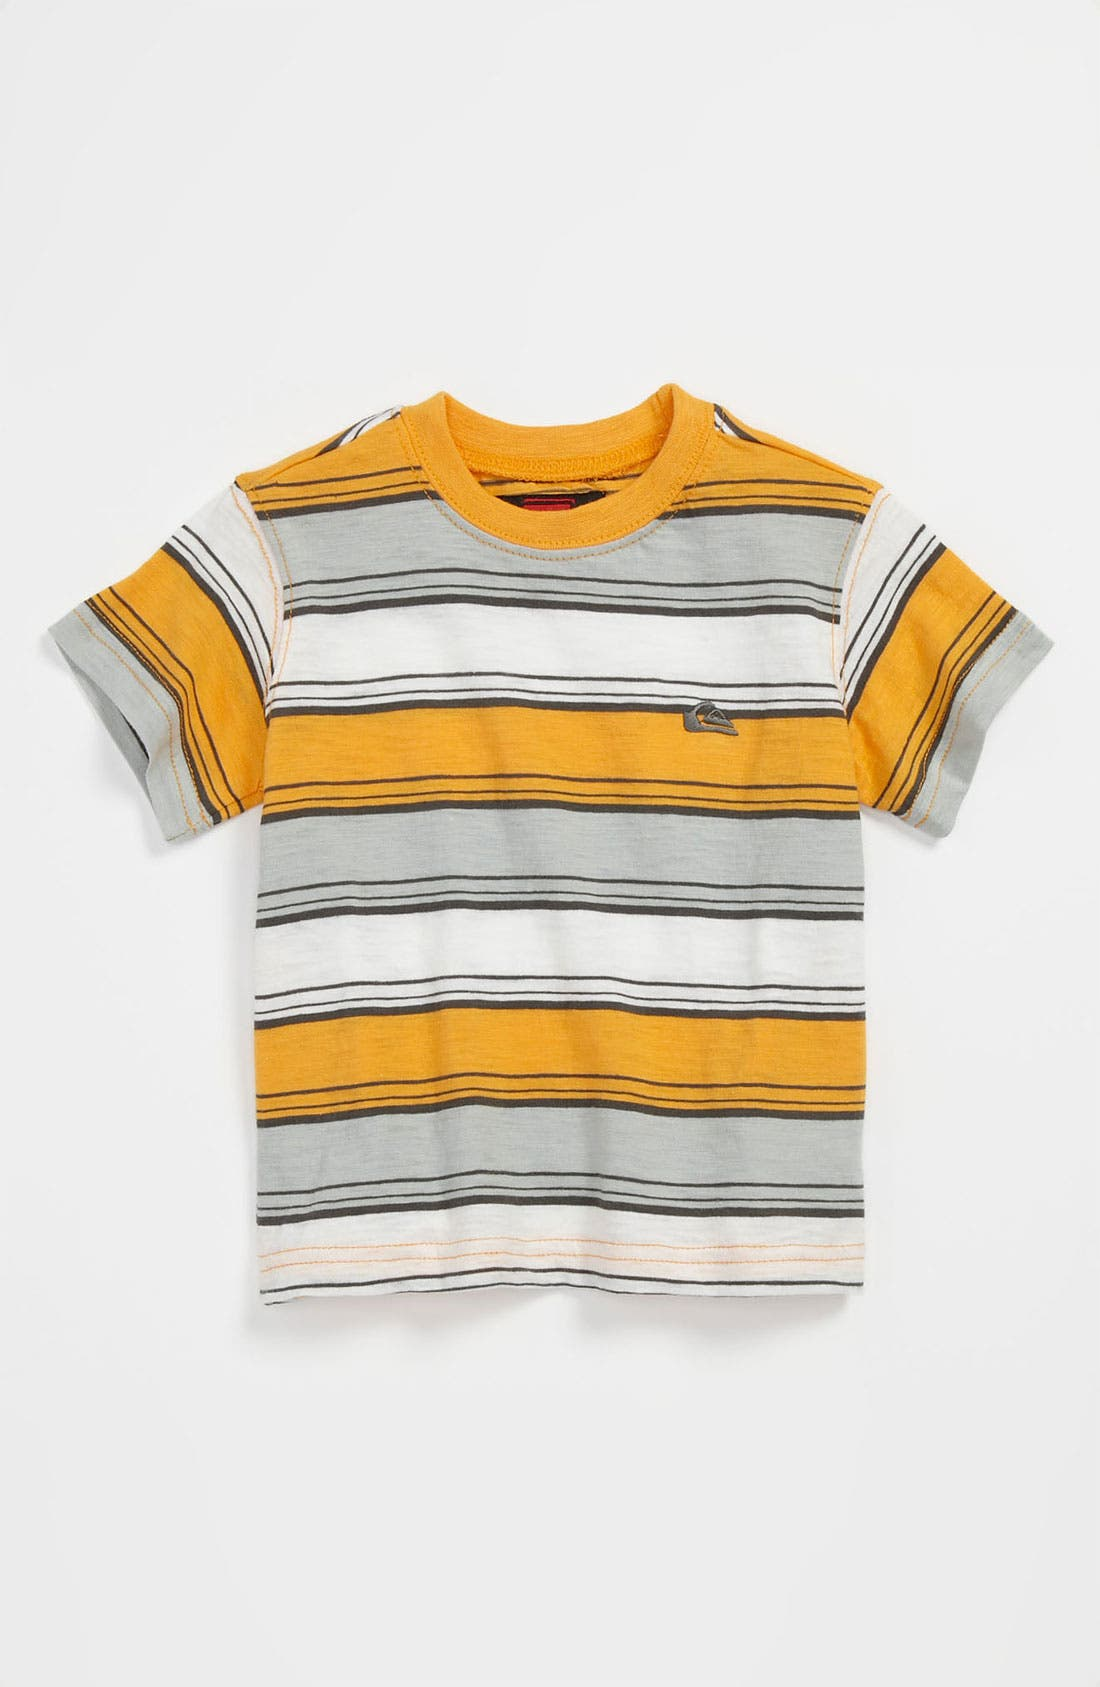 Alternate Image 1 Selected - Quiksilver 'Downside' Stripe Shirt (Baby)